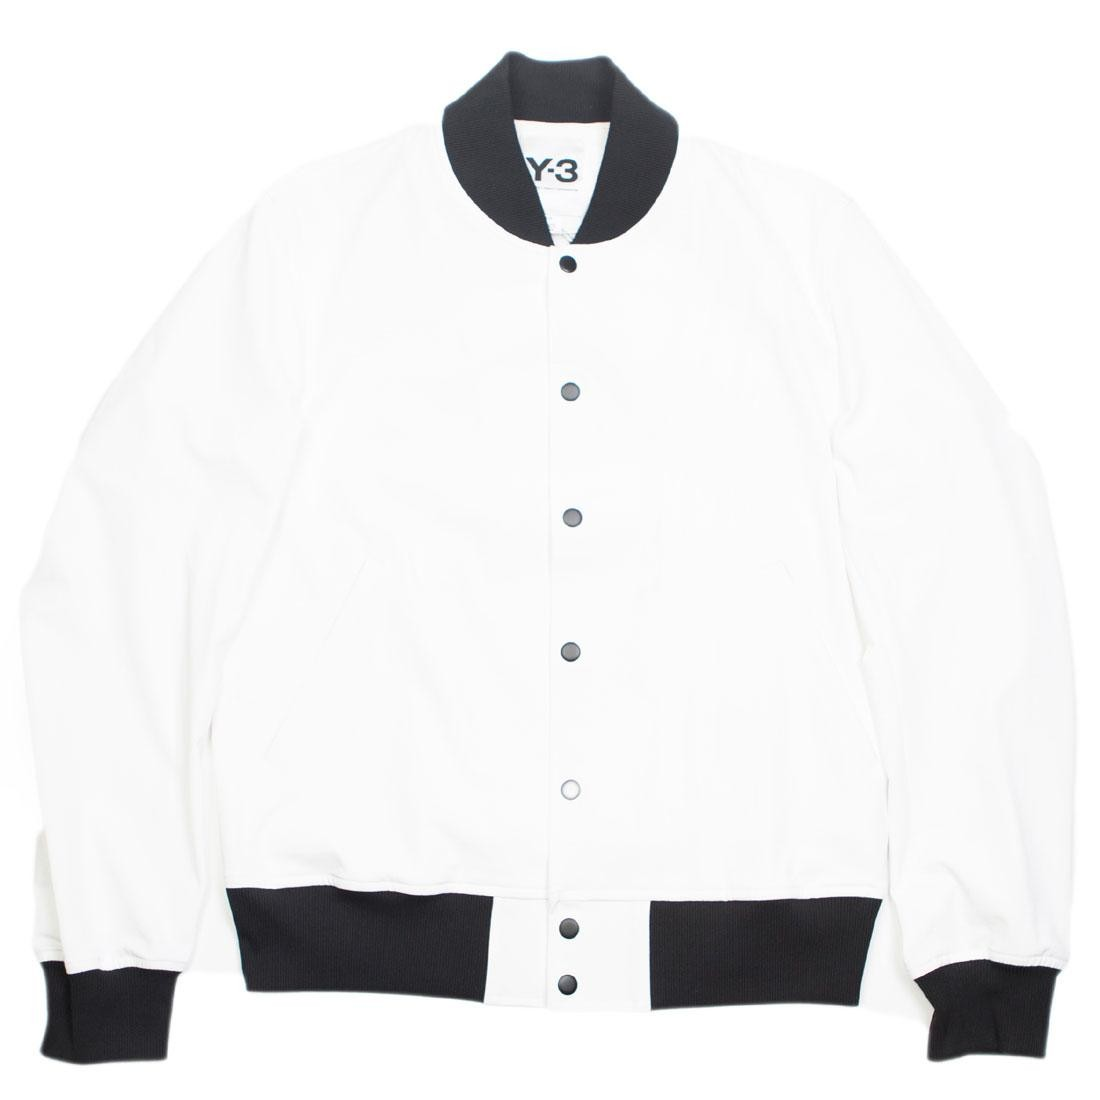 Adidas Y-3 Men PU Bomber Jacket (white / black)